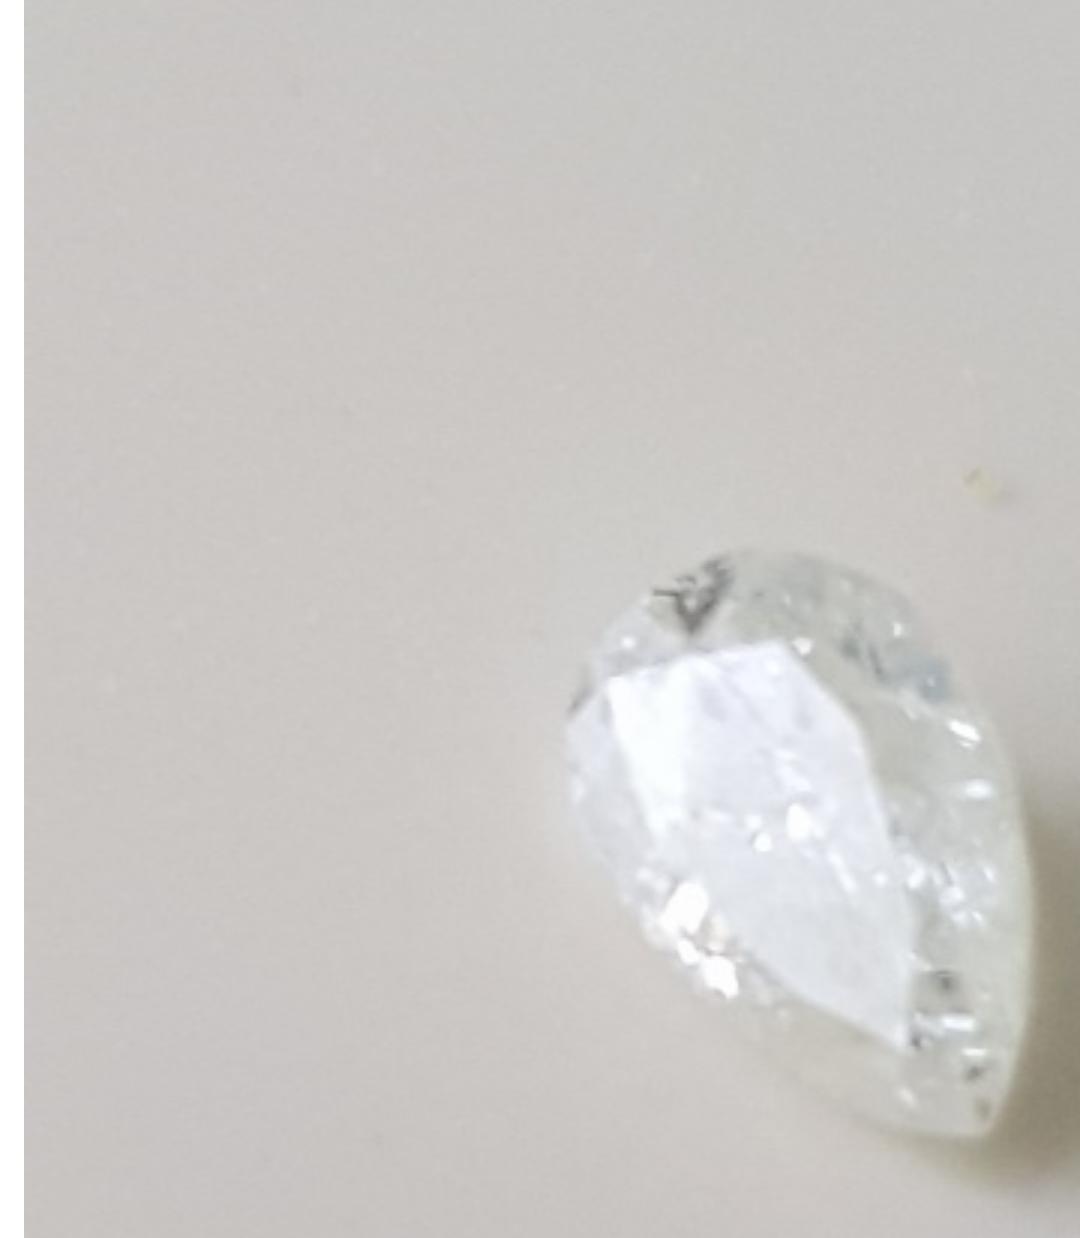 Pear shaped diamond loose diamond